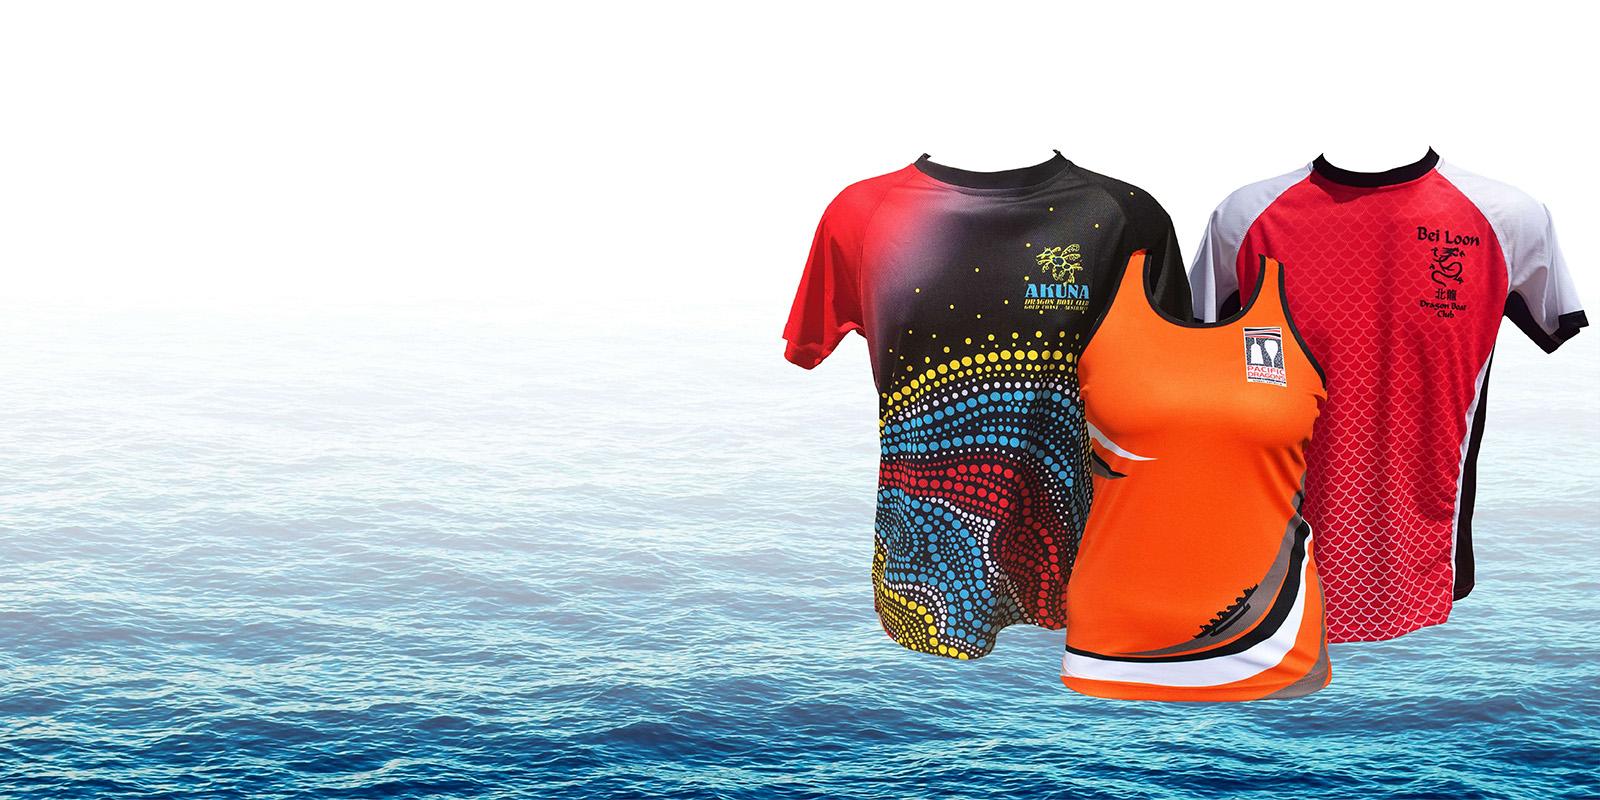 sports_dragon_boat_header_1600x800